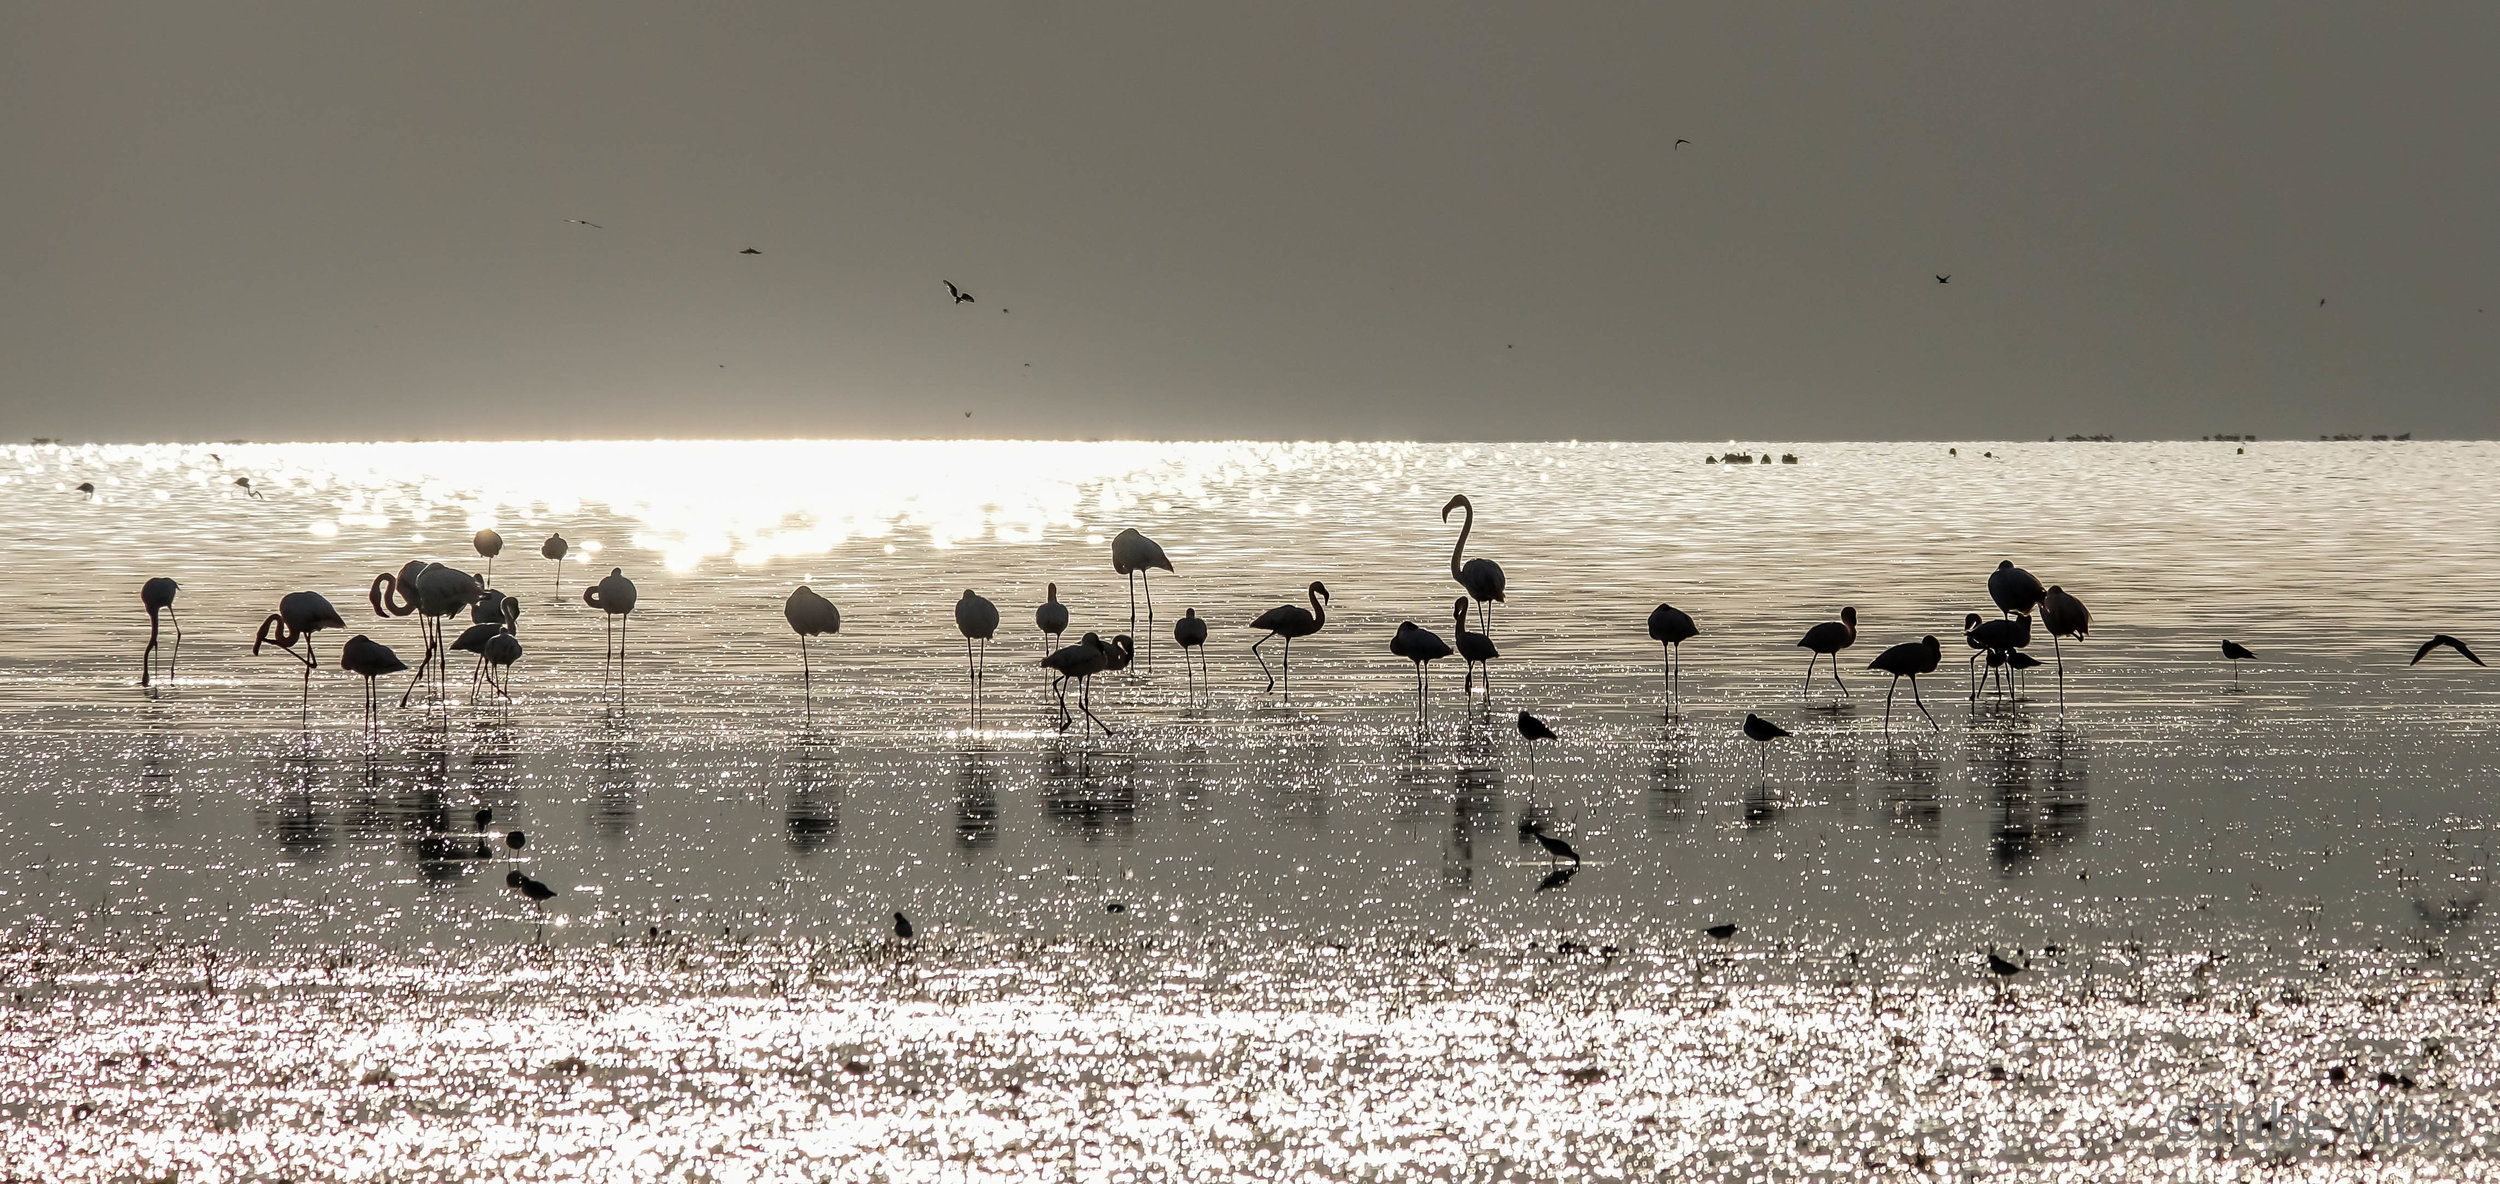 Lake Manyara birds, Tanzania30.jpg